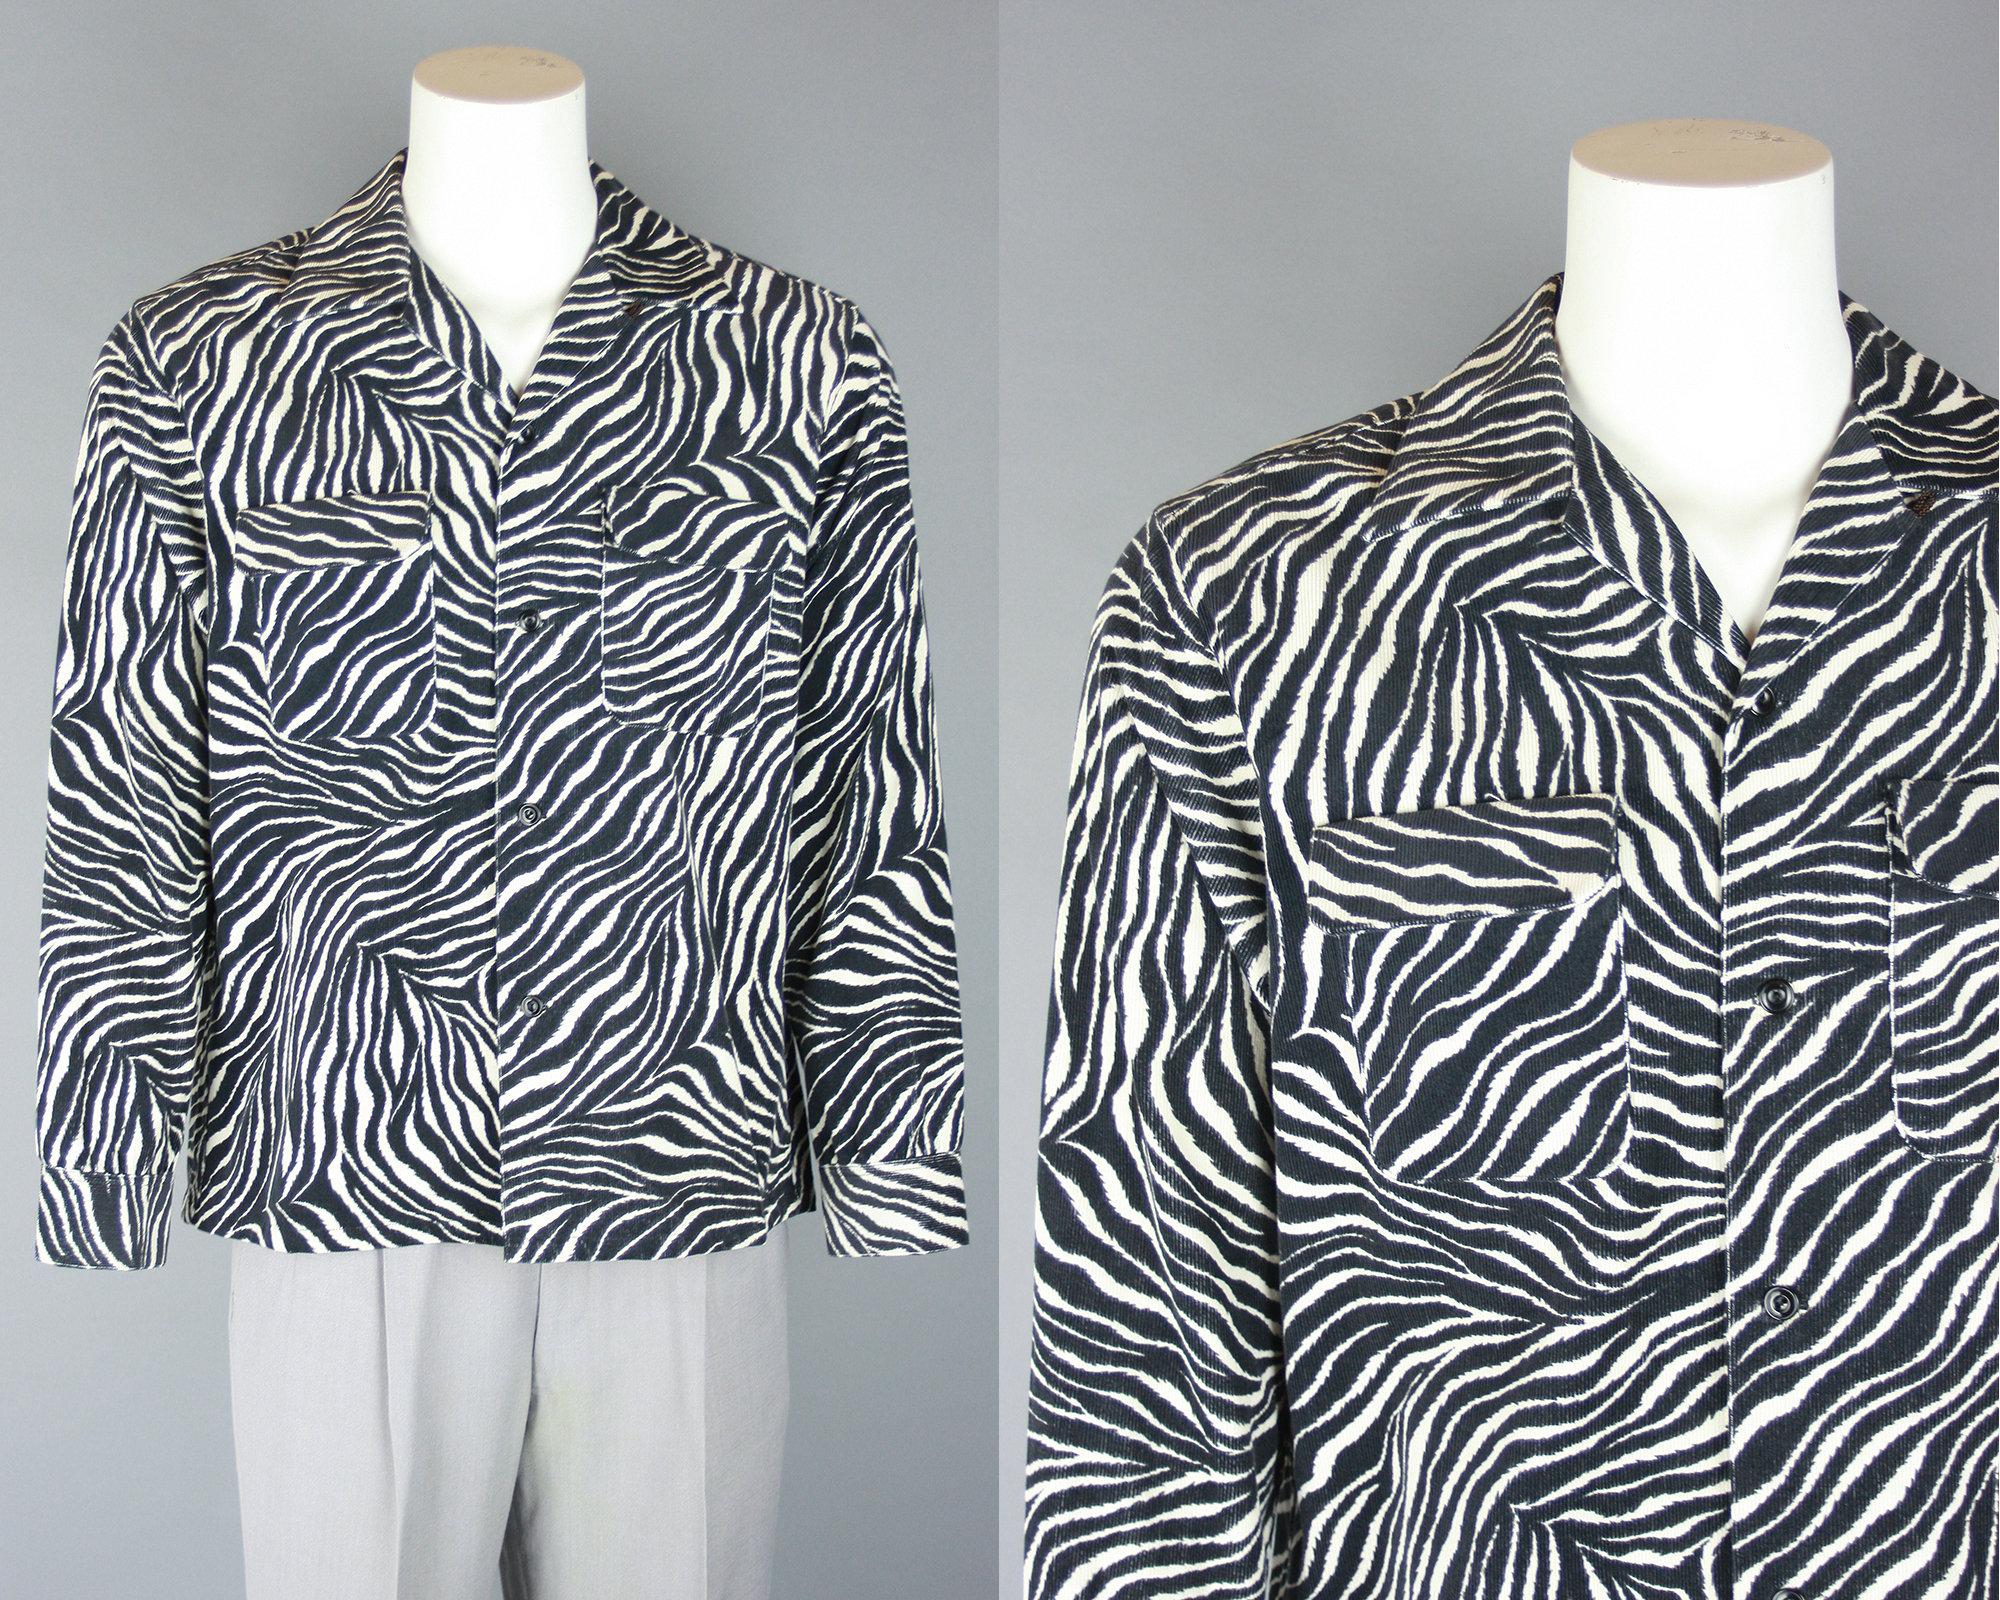 1950s Men's Ties, Bow Ties – Vintage, Skinny, Knit Groovin High Zebra Print Shirt  1940S 1950S Style Mens Corduroy Long Sleeved Rockabilly Large $195.00 AT vintagedancer.com